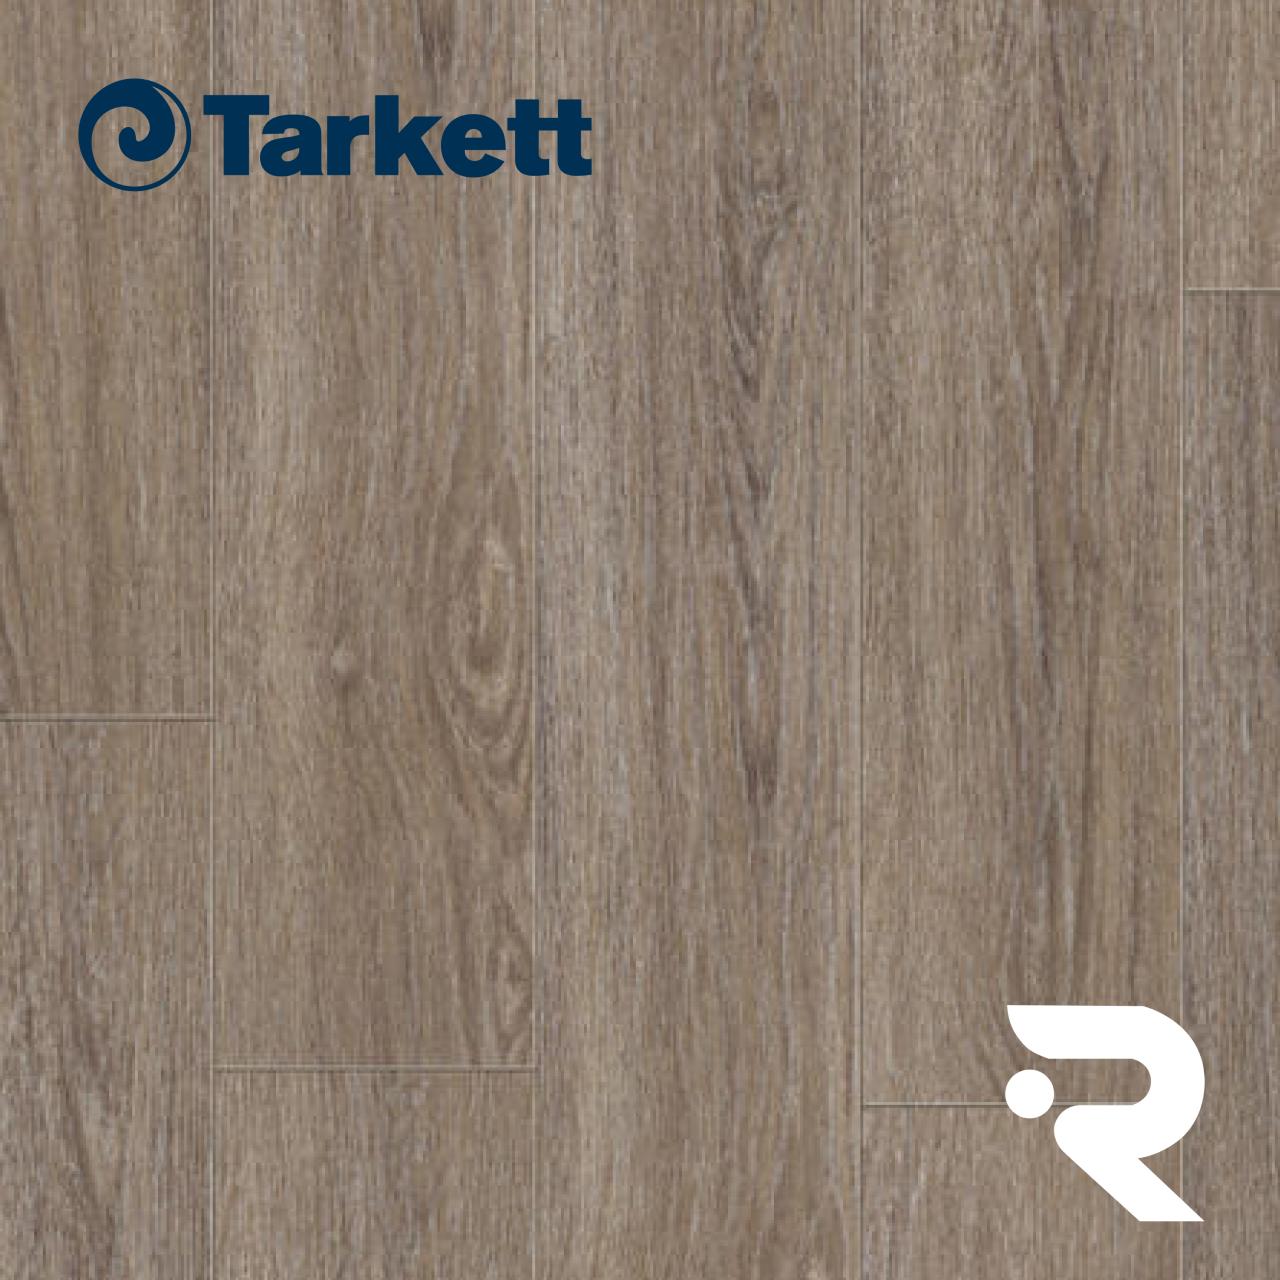 🌳 ПВХ плитка Tarkett | LOUNGE - CHARANGO | Art Vinyl | 914 x 152 мм